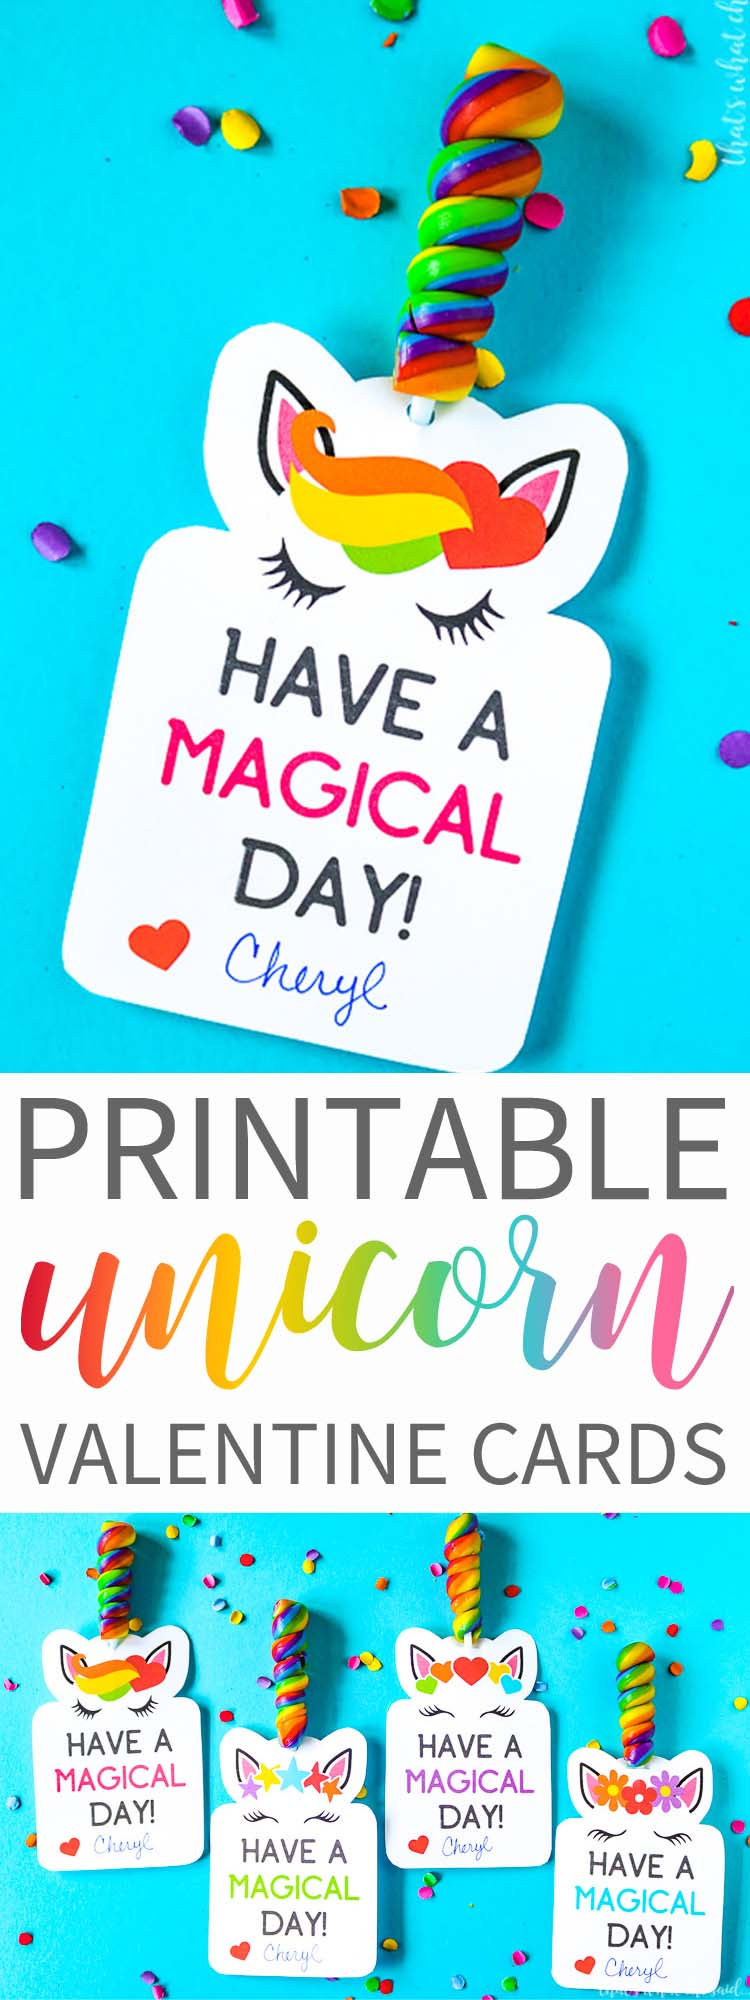 Printable Unicorn Valentine Cards